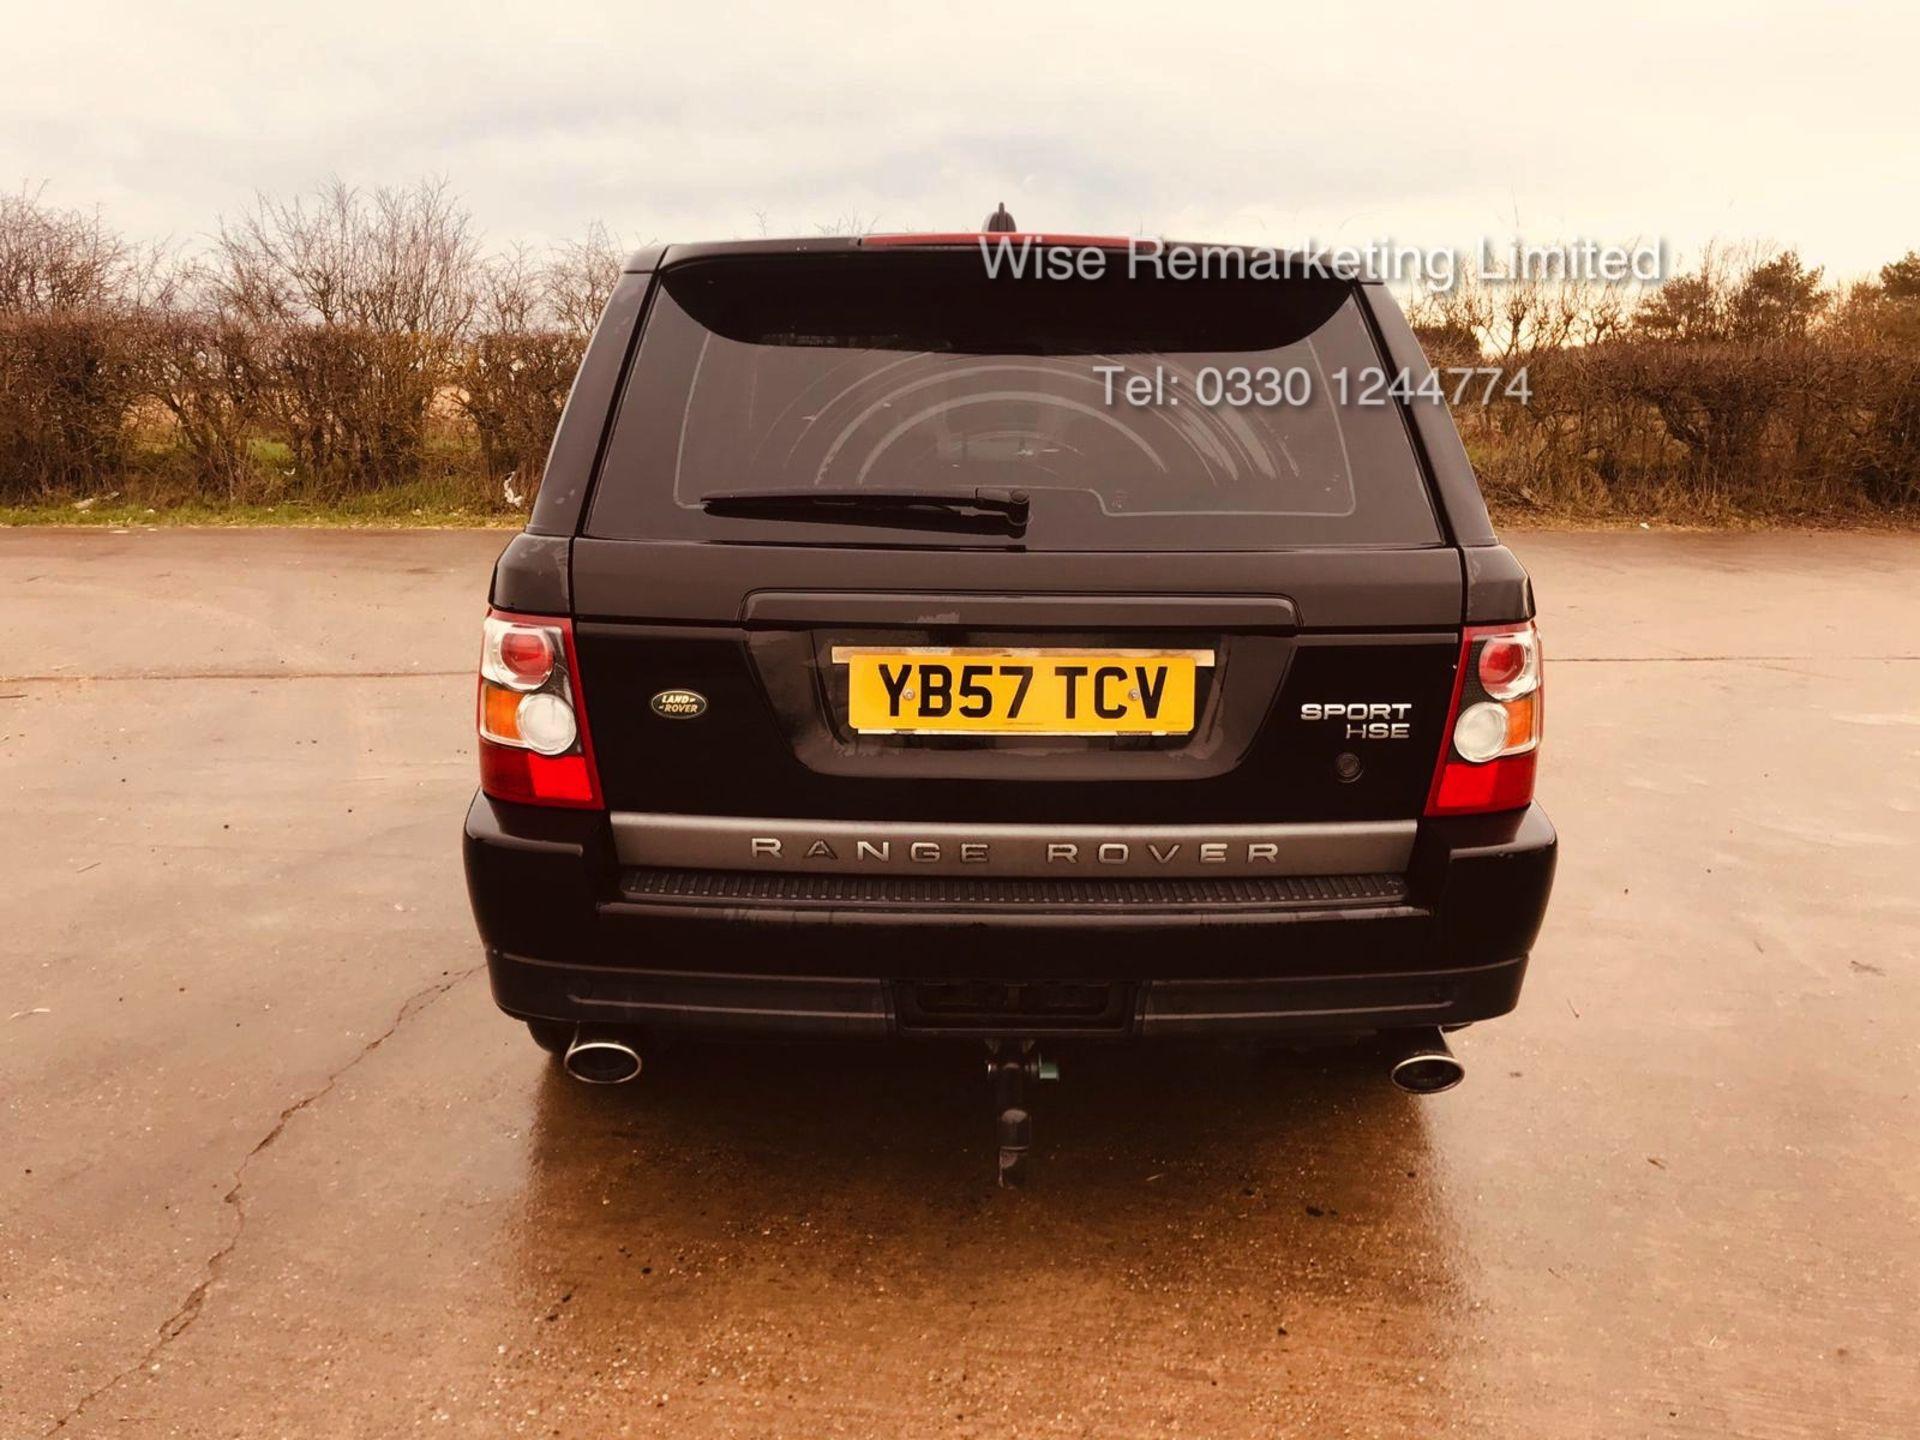 Range Rover Sport 2.7 TDV6 HSE Auto - 2008 Model - Cream Leather - Sat Nav - Heated Seats - Image 2 of 19